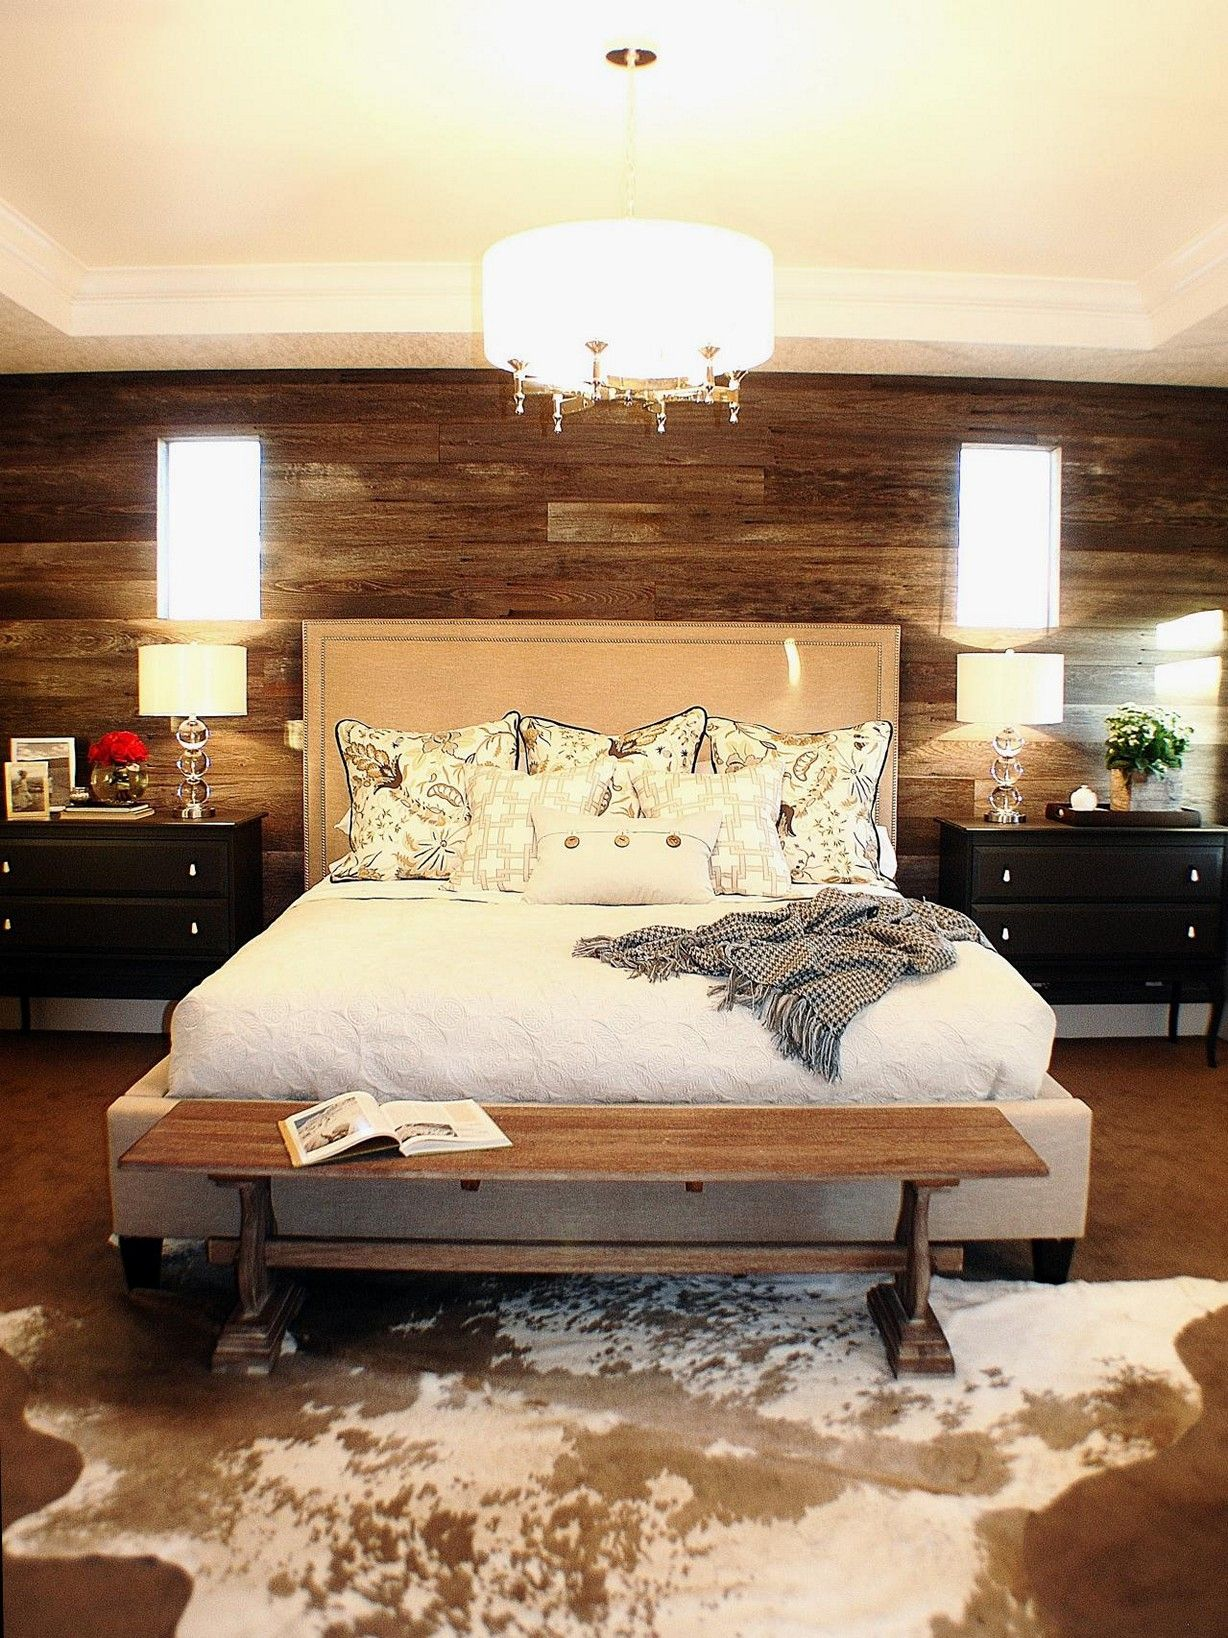 Accentwall Ideas Decor Wall Chic Master Bedroom Rustic Master Bedroom Eclectic Bedroom Eclectic bedroom wall ideas